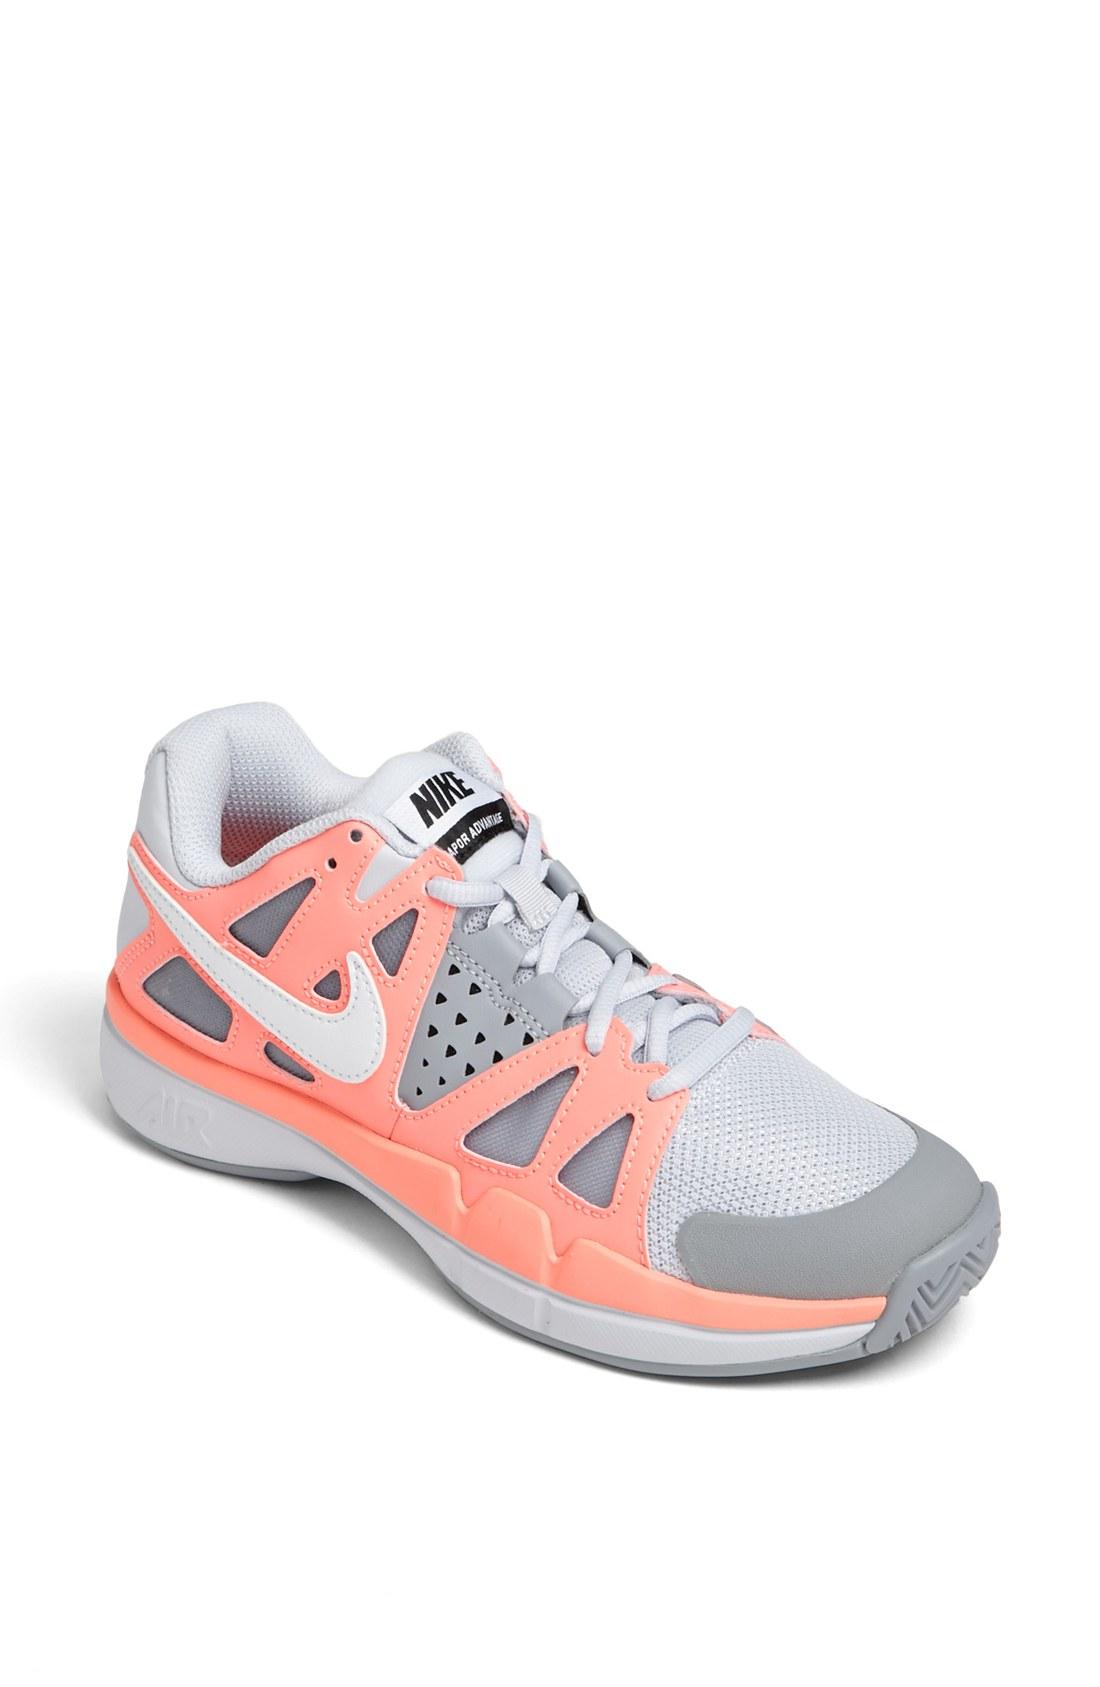 Nike Air Vapor Advantage Grey Tennis Shoes